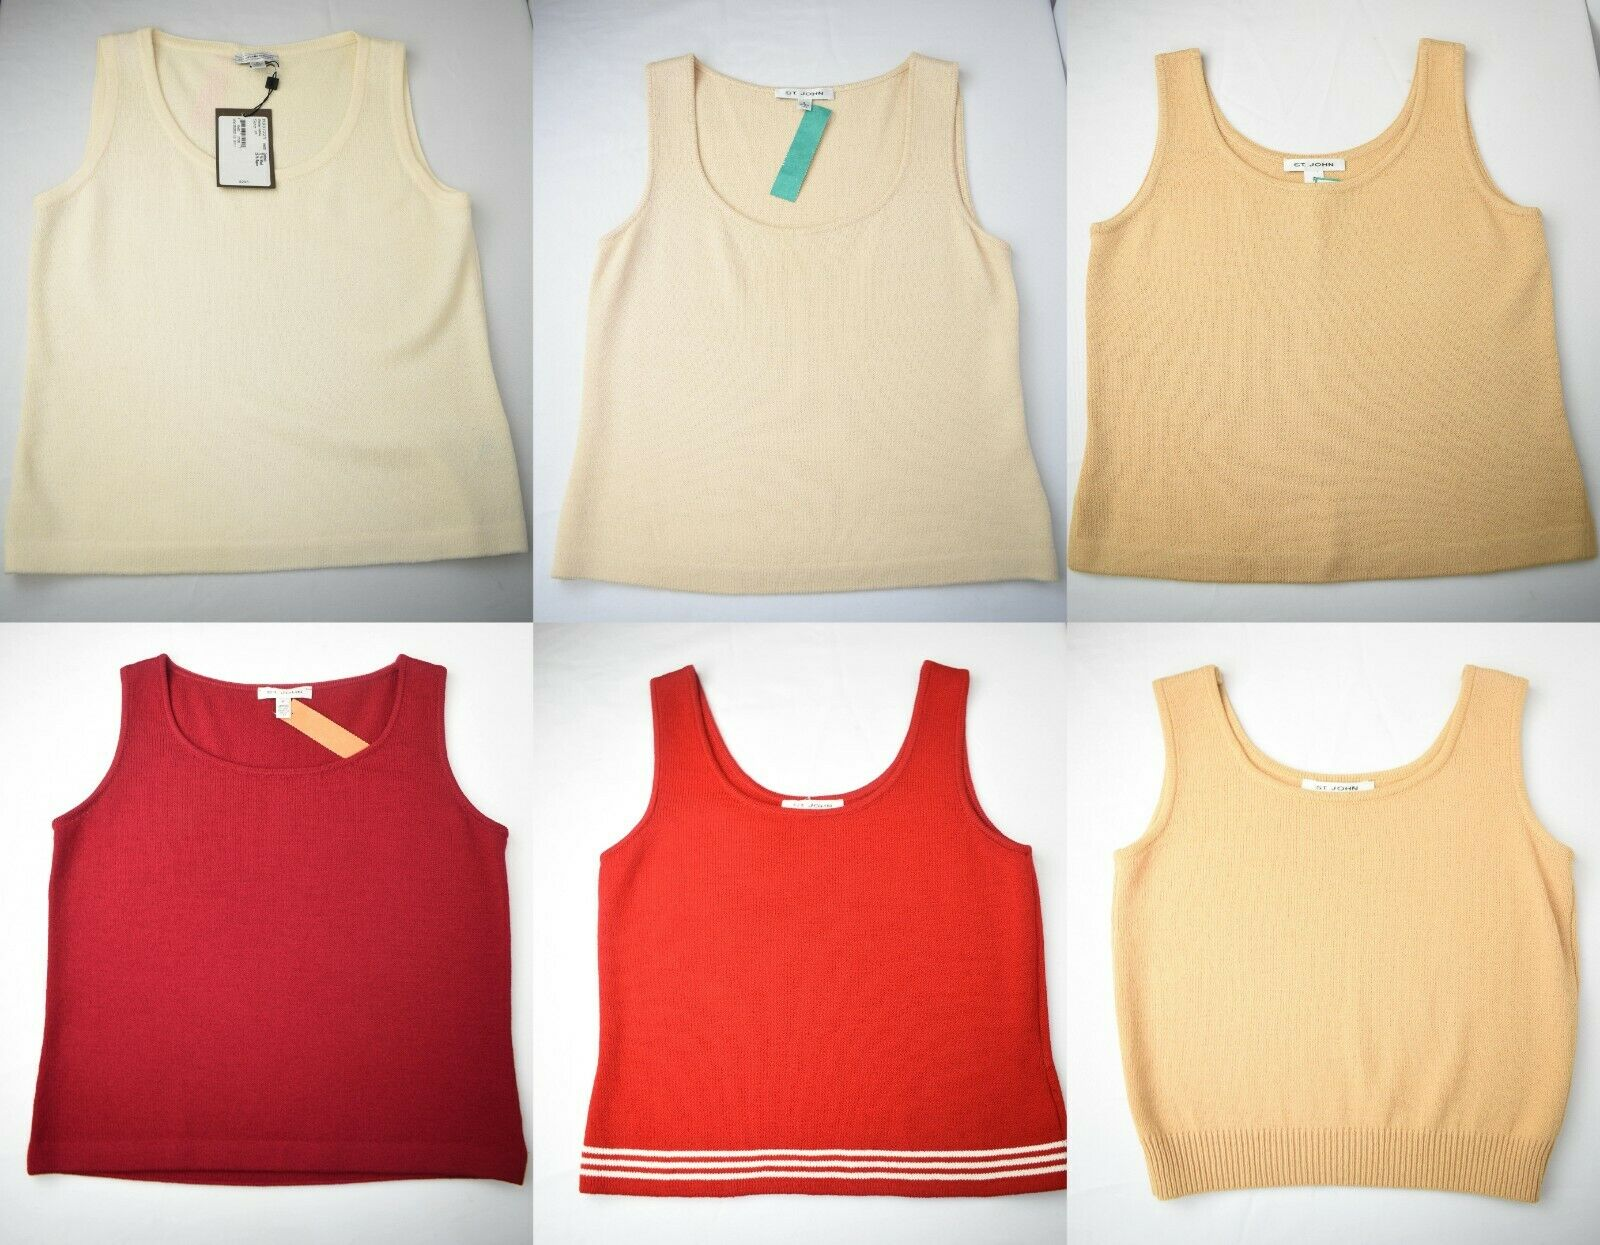 NEW St. John Santana Knit Shell Top Sleeveless Multicolor Wool Blend P